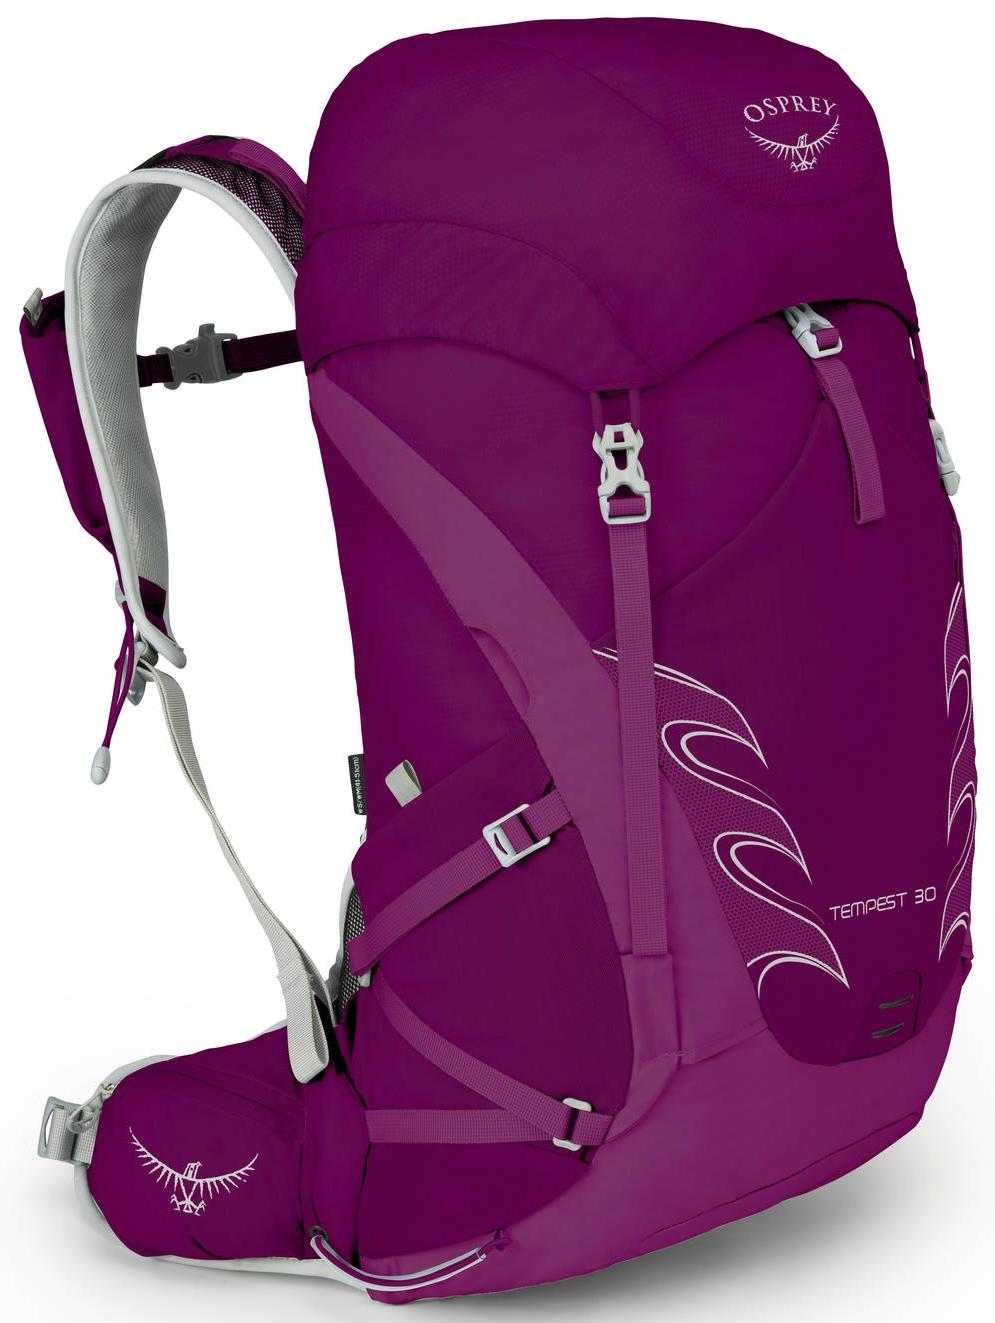 Osprey Tempest 16 Womens Rucksack Hiking Backpack Mystic Magenta One Size